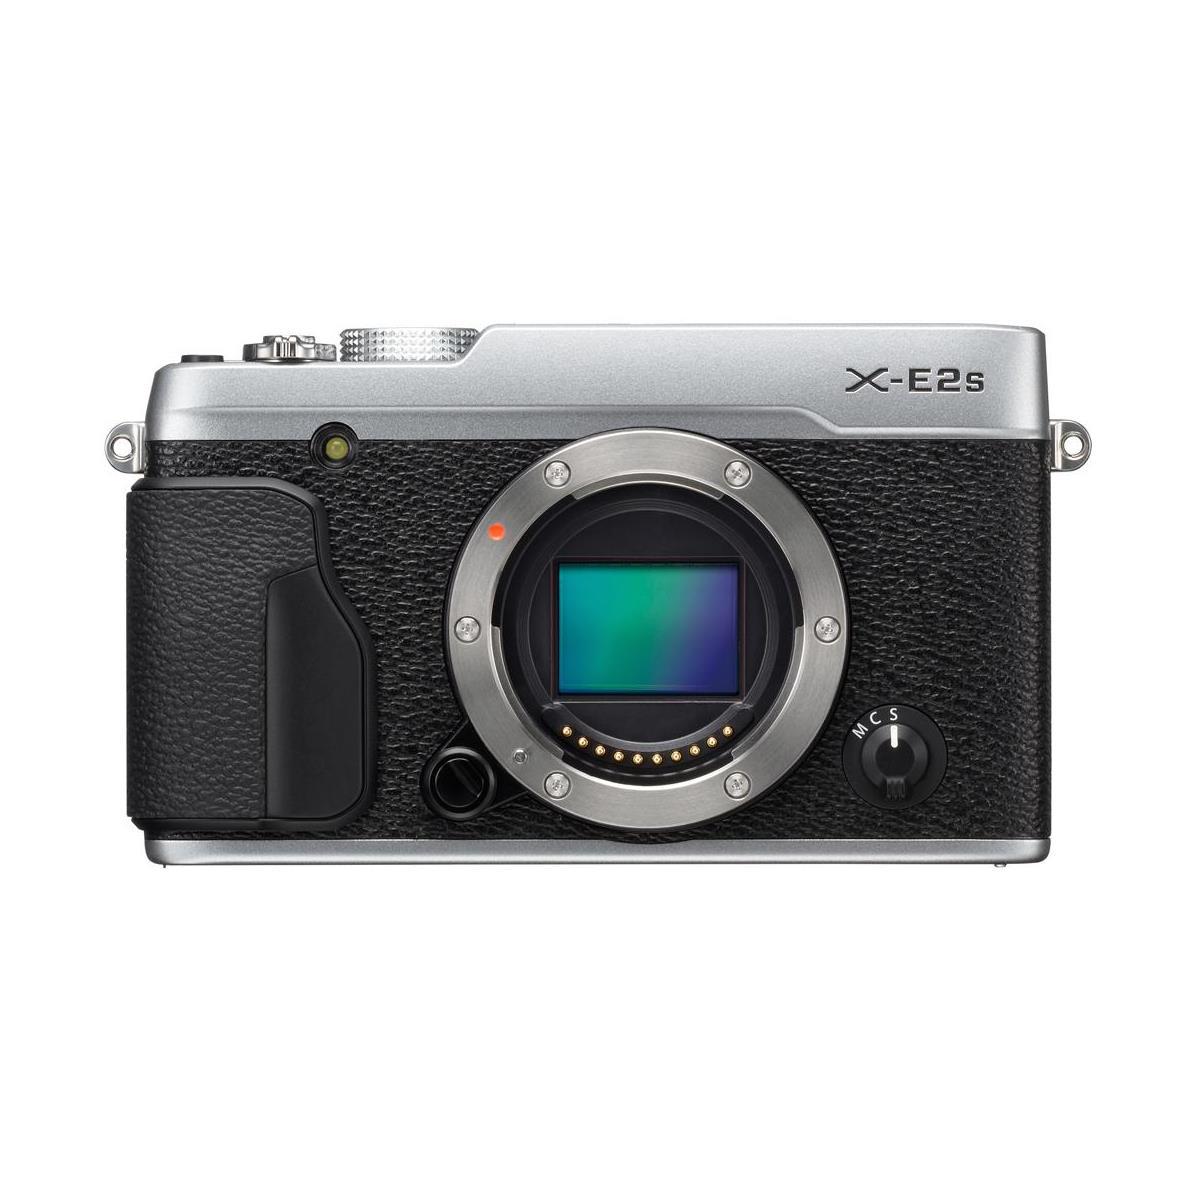 Fujifilm X-E2S Mirrorless Camera (Body) $350 + free s/h